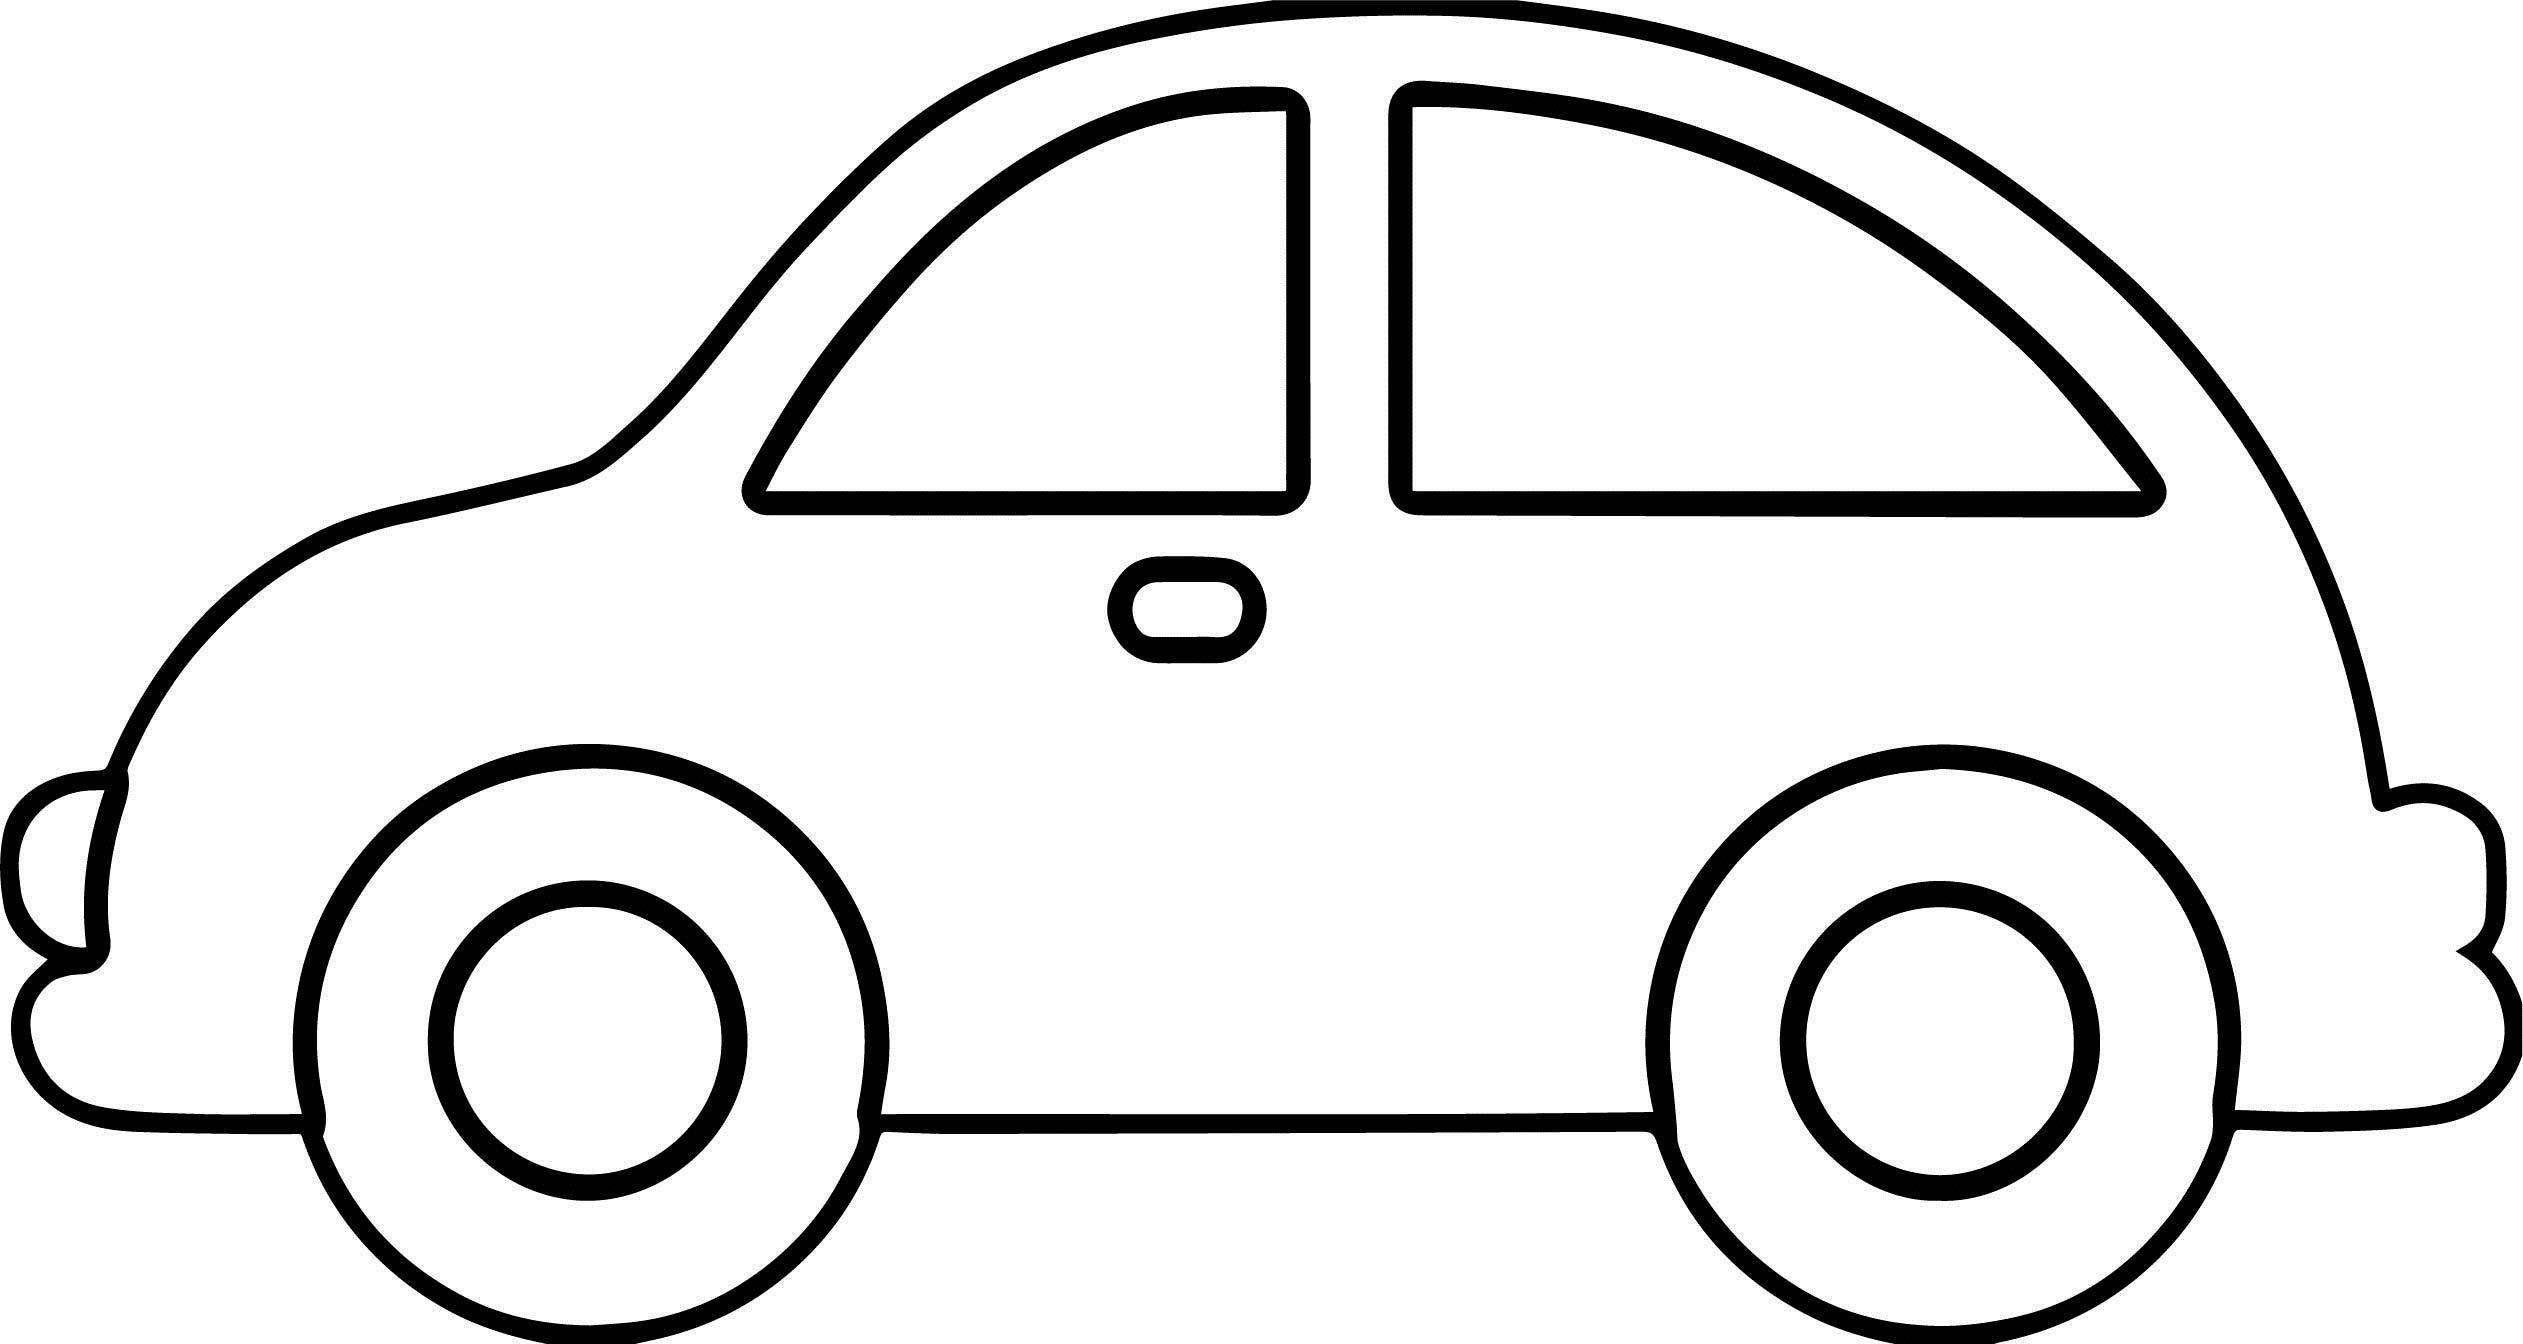 Rezultat Poiska Google Dlya Https E Ipar Ru Wp Content Uploads 2019 12 Image15 17 Jpg Simple Car Drawing Cars Coloring Pages Easy Drawings